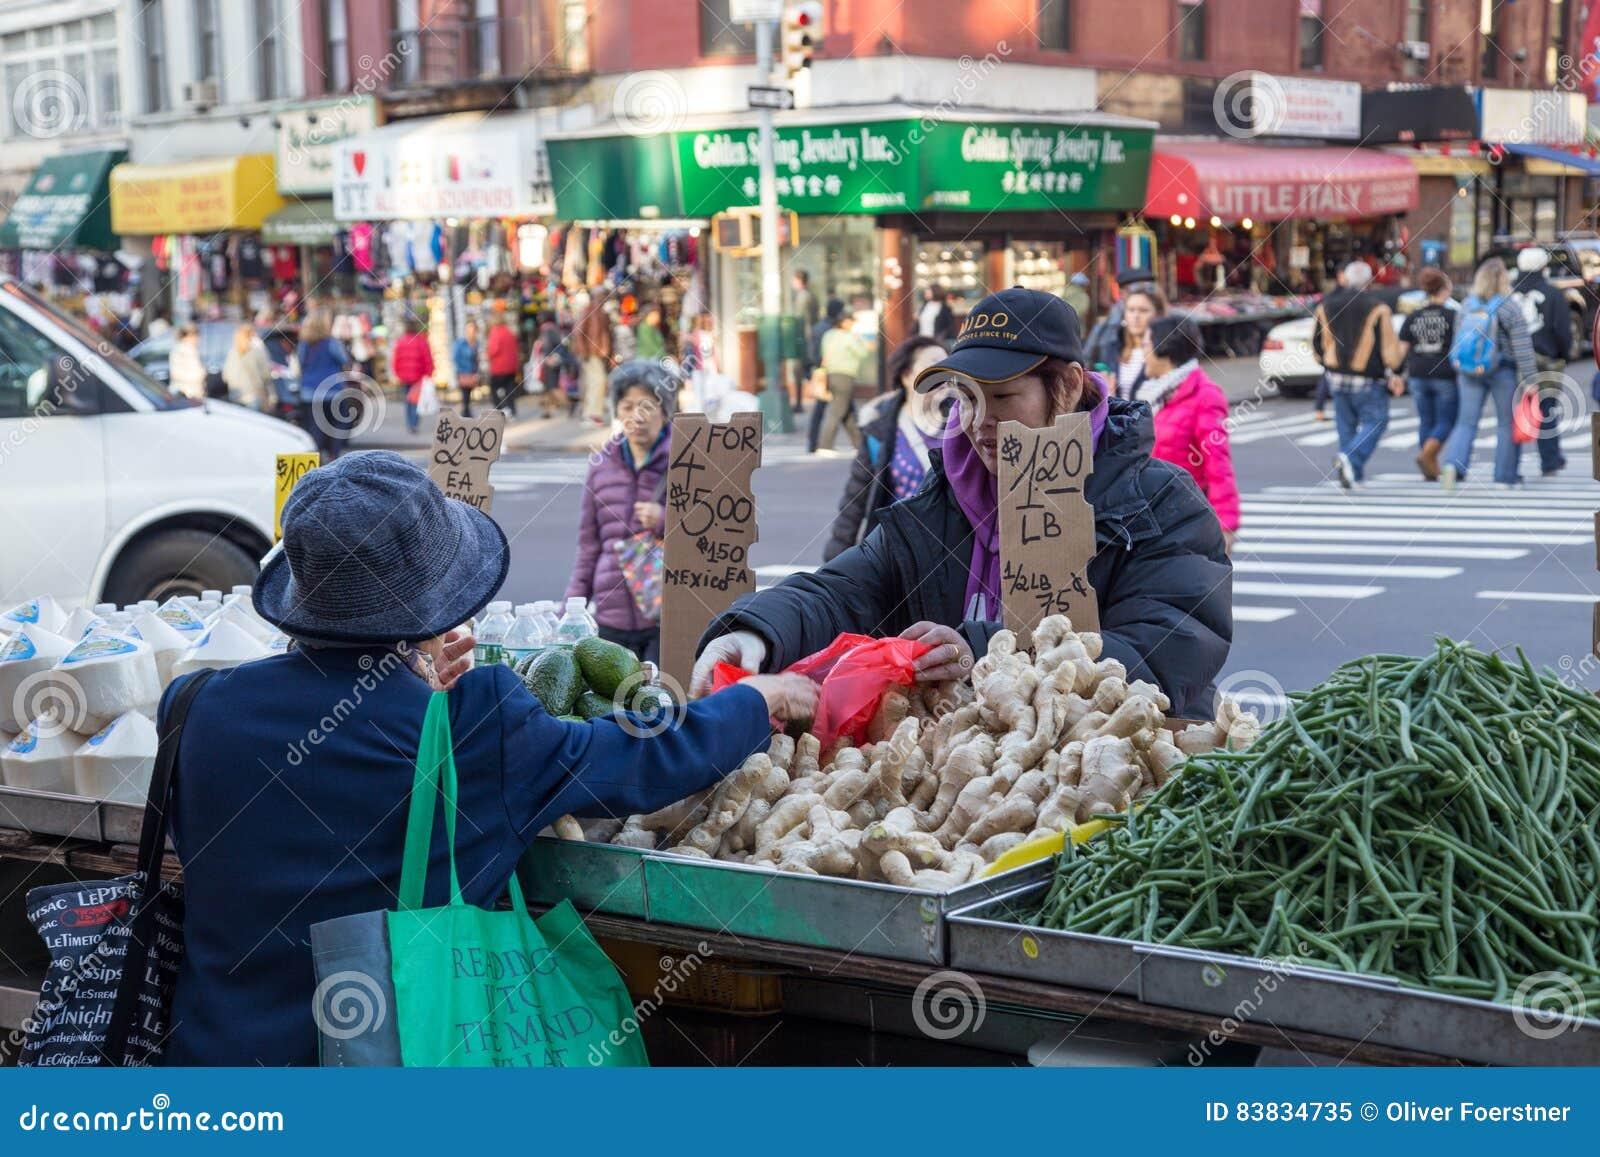 Chinatown market stalls in New York City